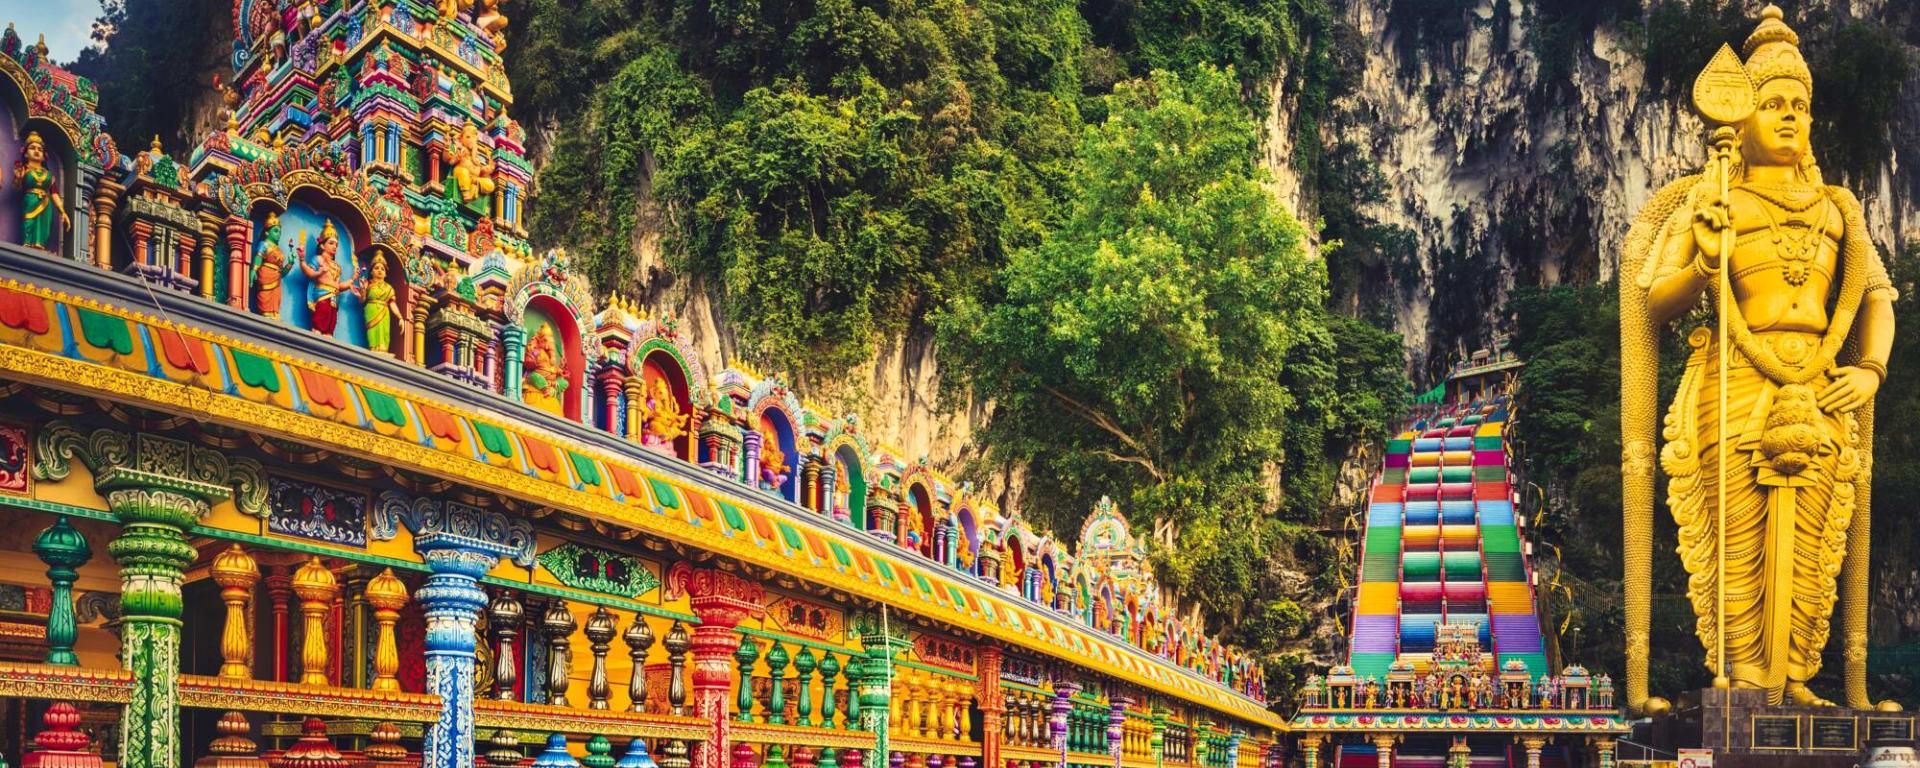 Malaysia entdecken mit Tischler Reisen: Malaysia Hindutempel Batu Hoehlen